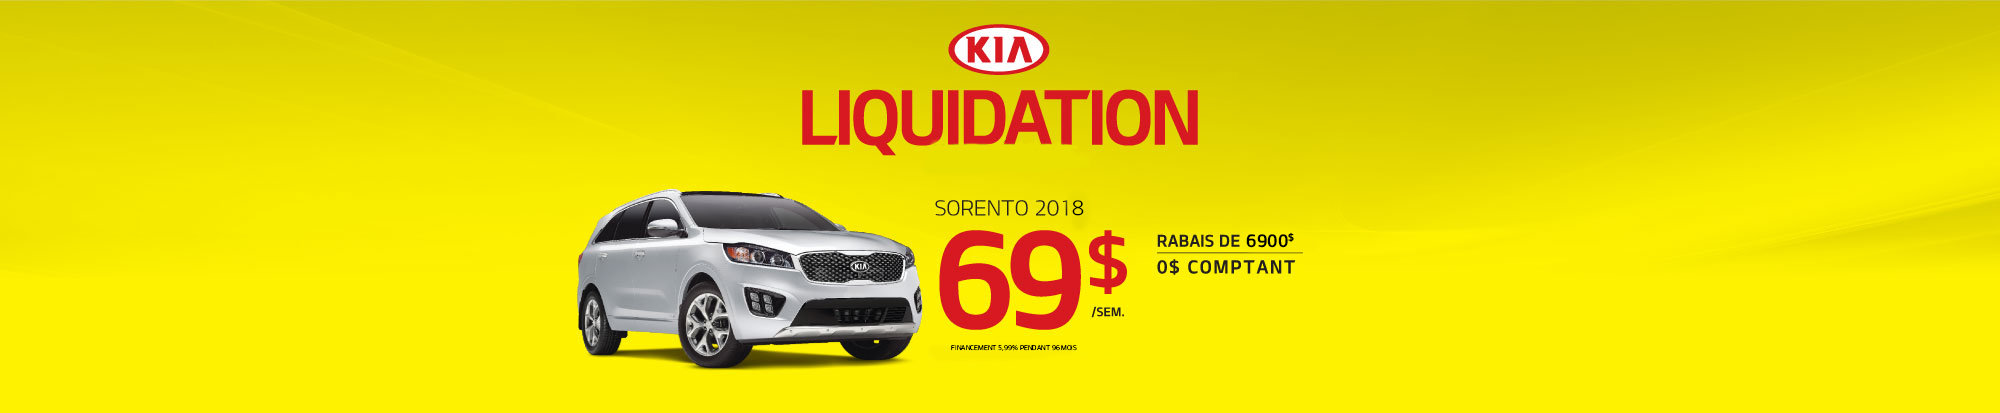 Liquidation - Sorento - web